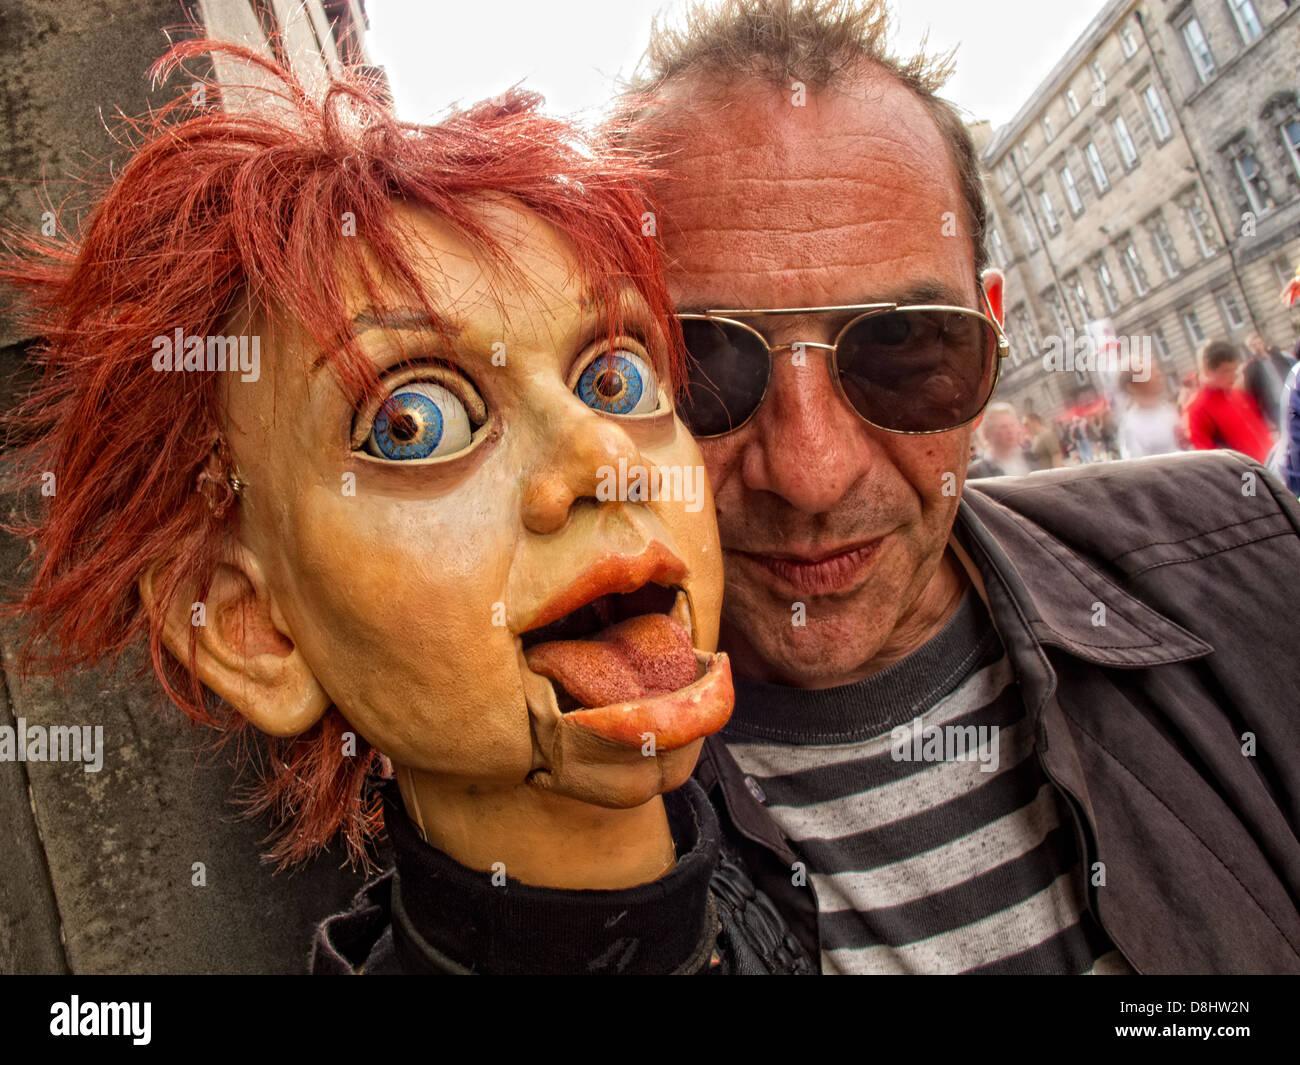 Edinburgh Festival Fringe Act, Scotland, UK, EH1 1QS - Stock Image